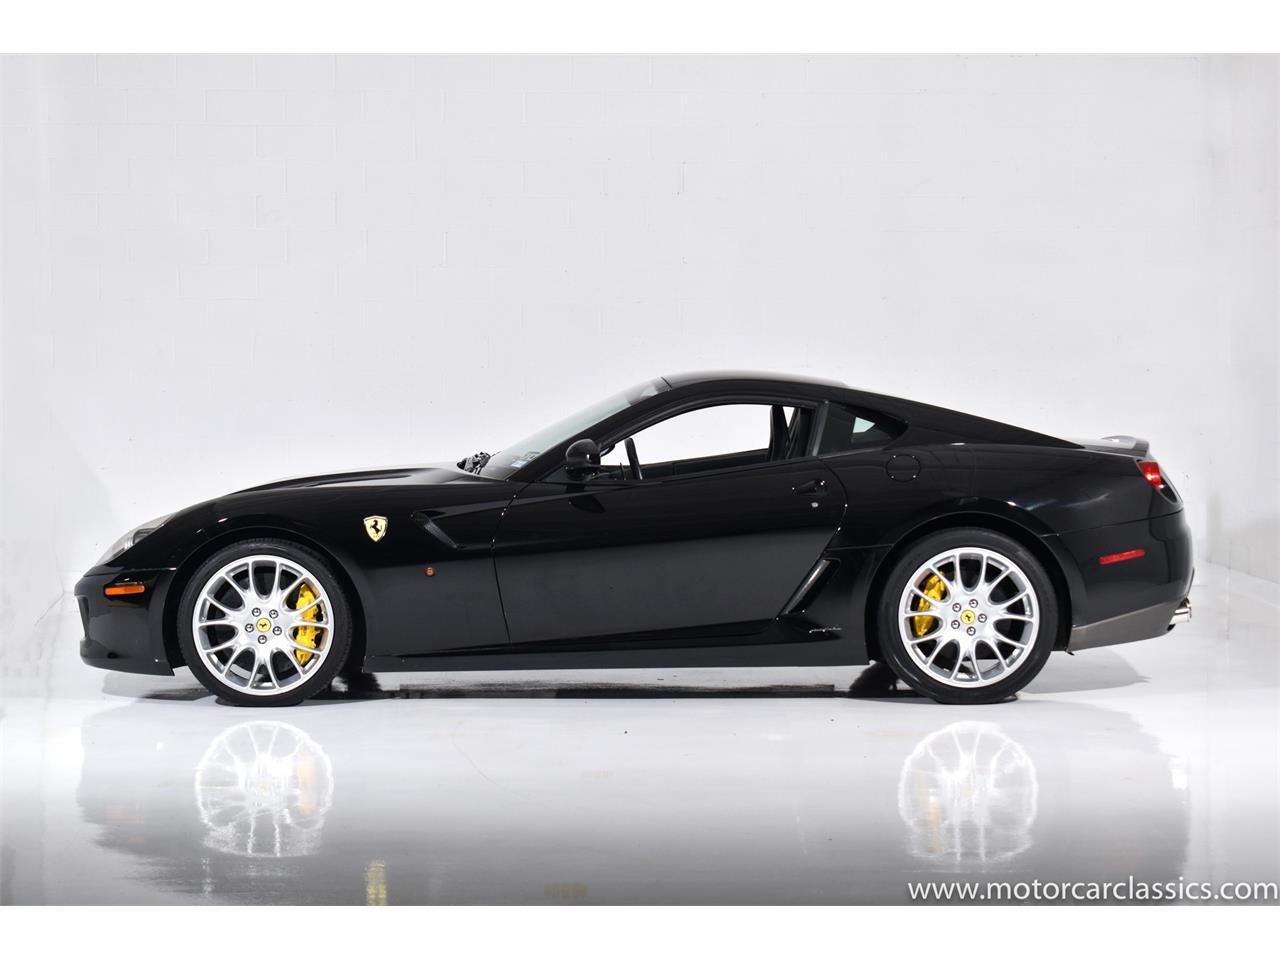 2007 Ferrari 599 (CC-1249502) for sale in Farmingdale, New York